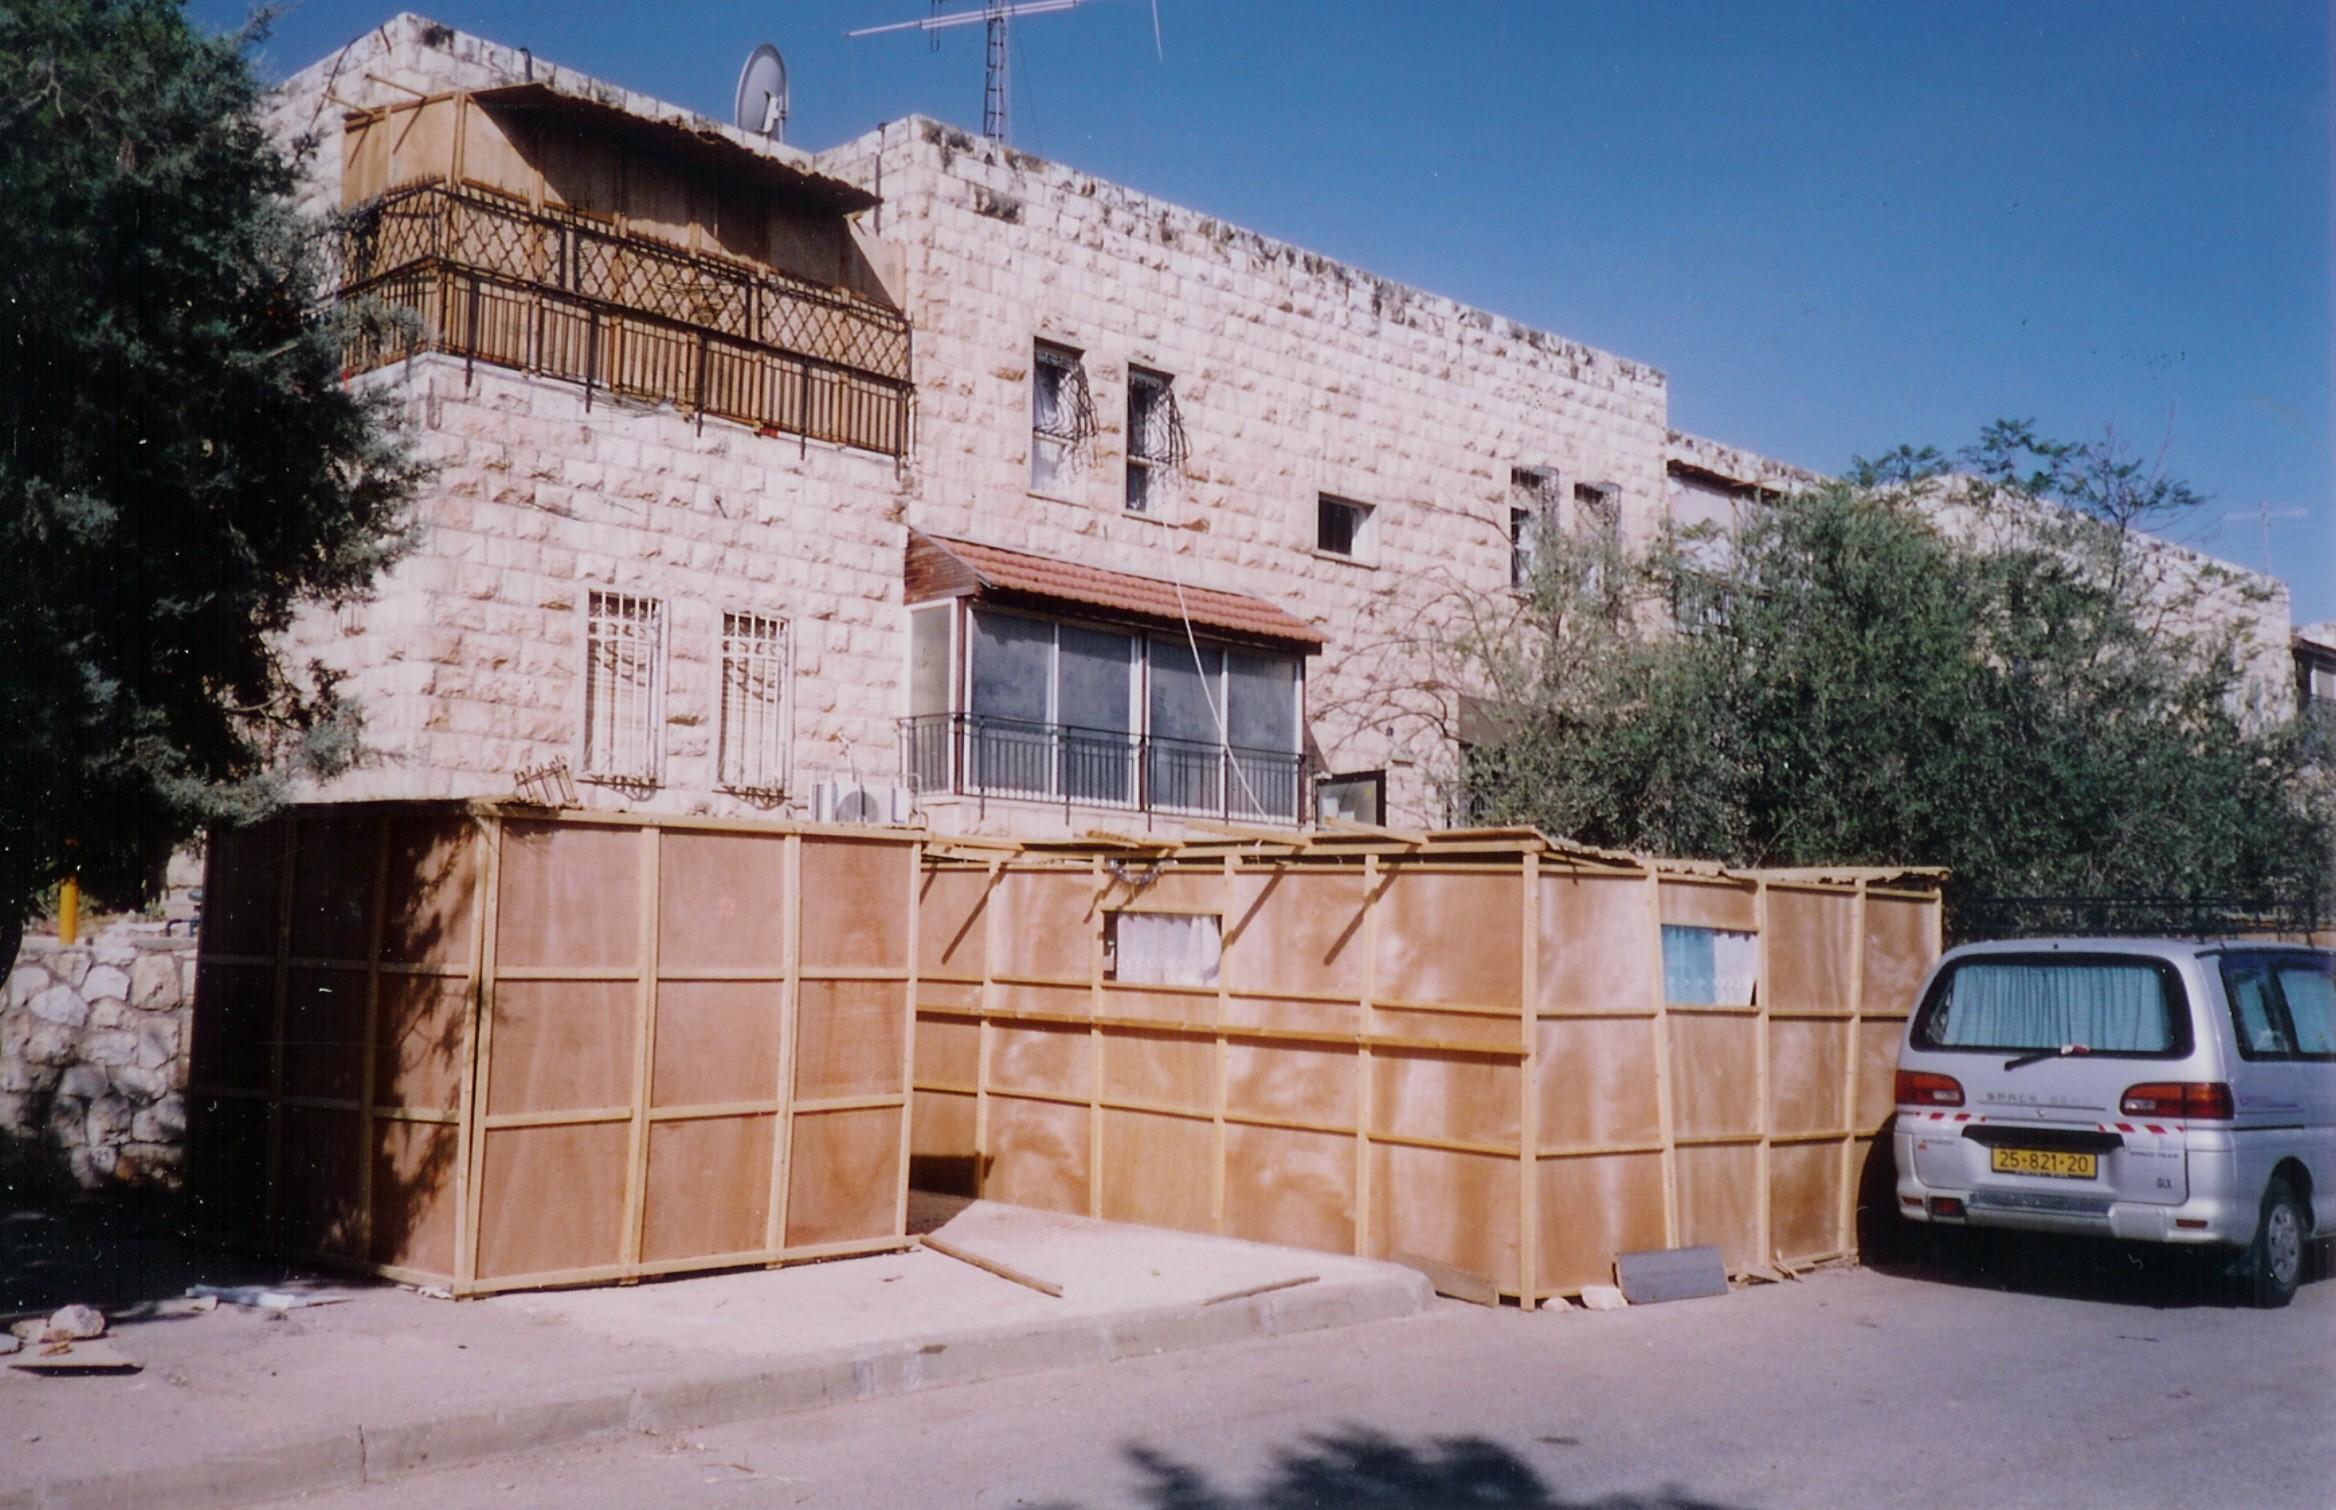 Jerusalemsukkas